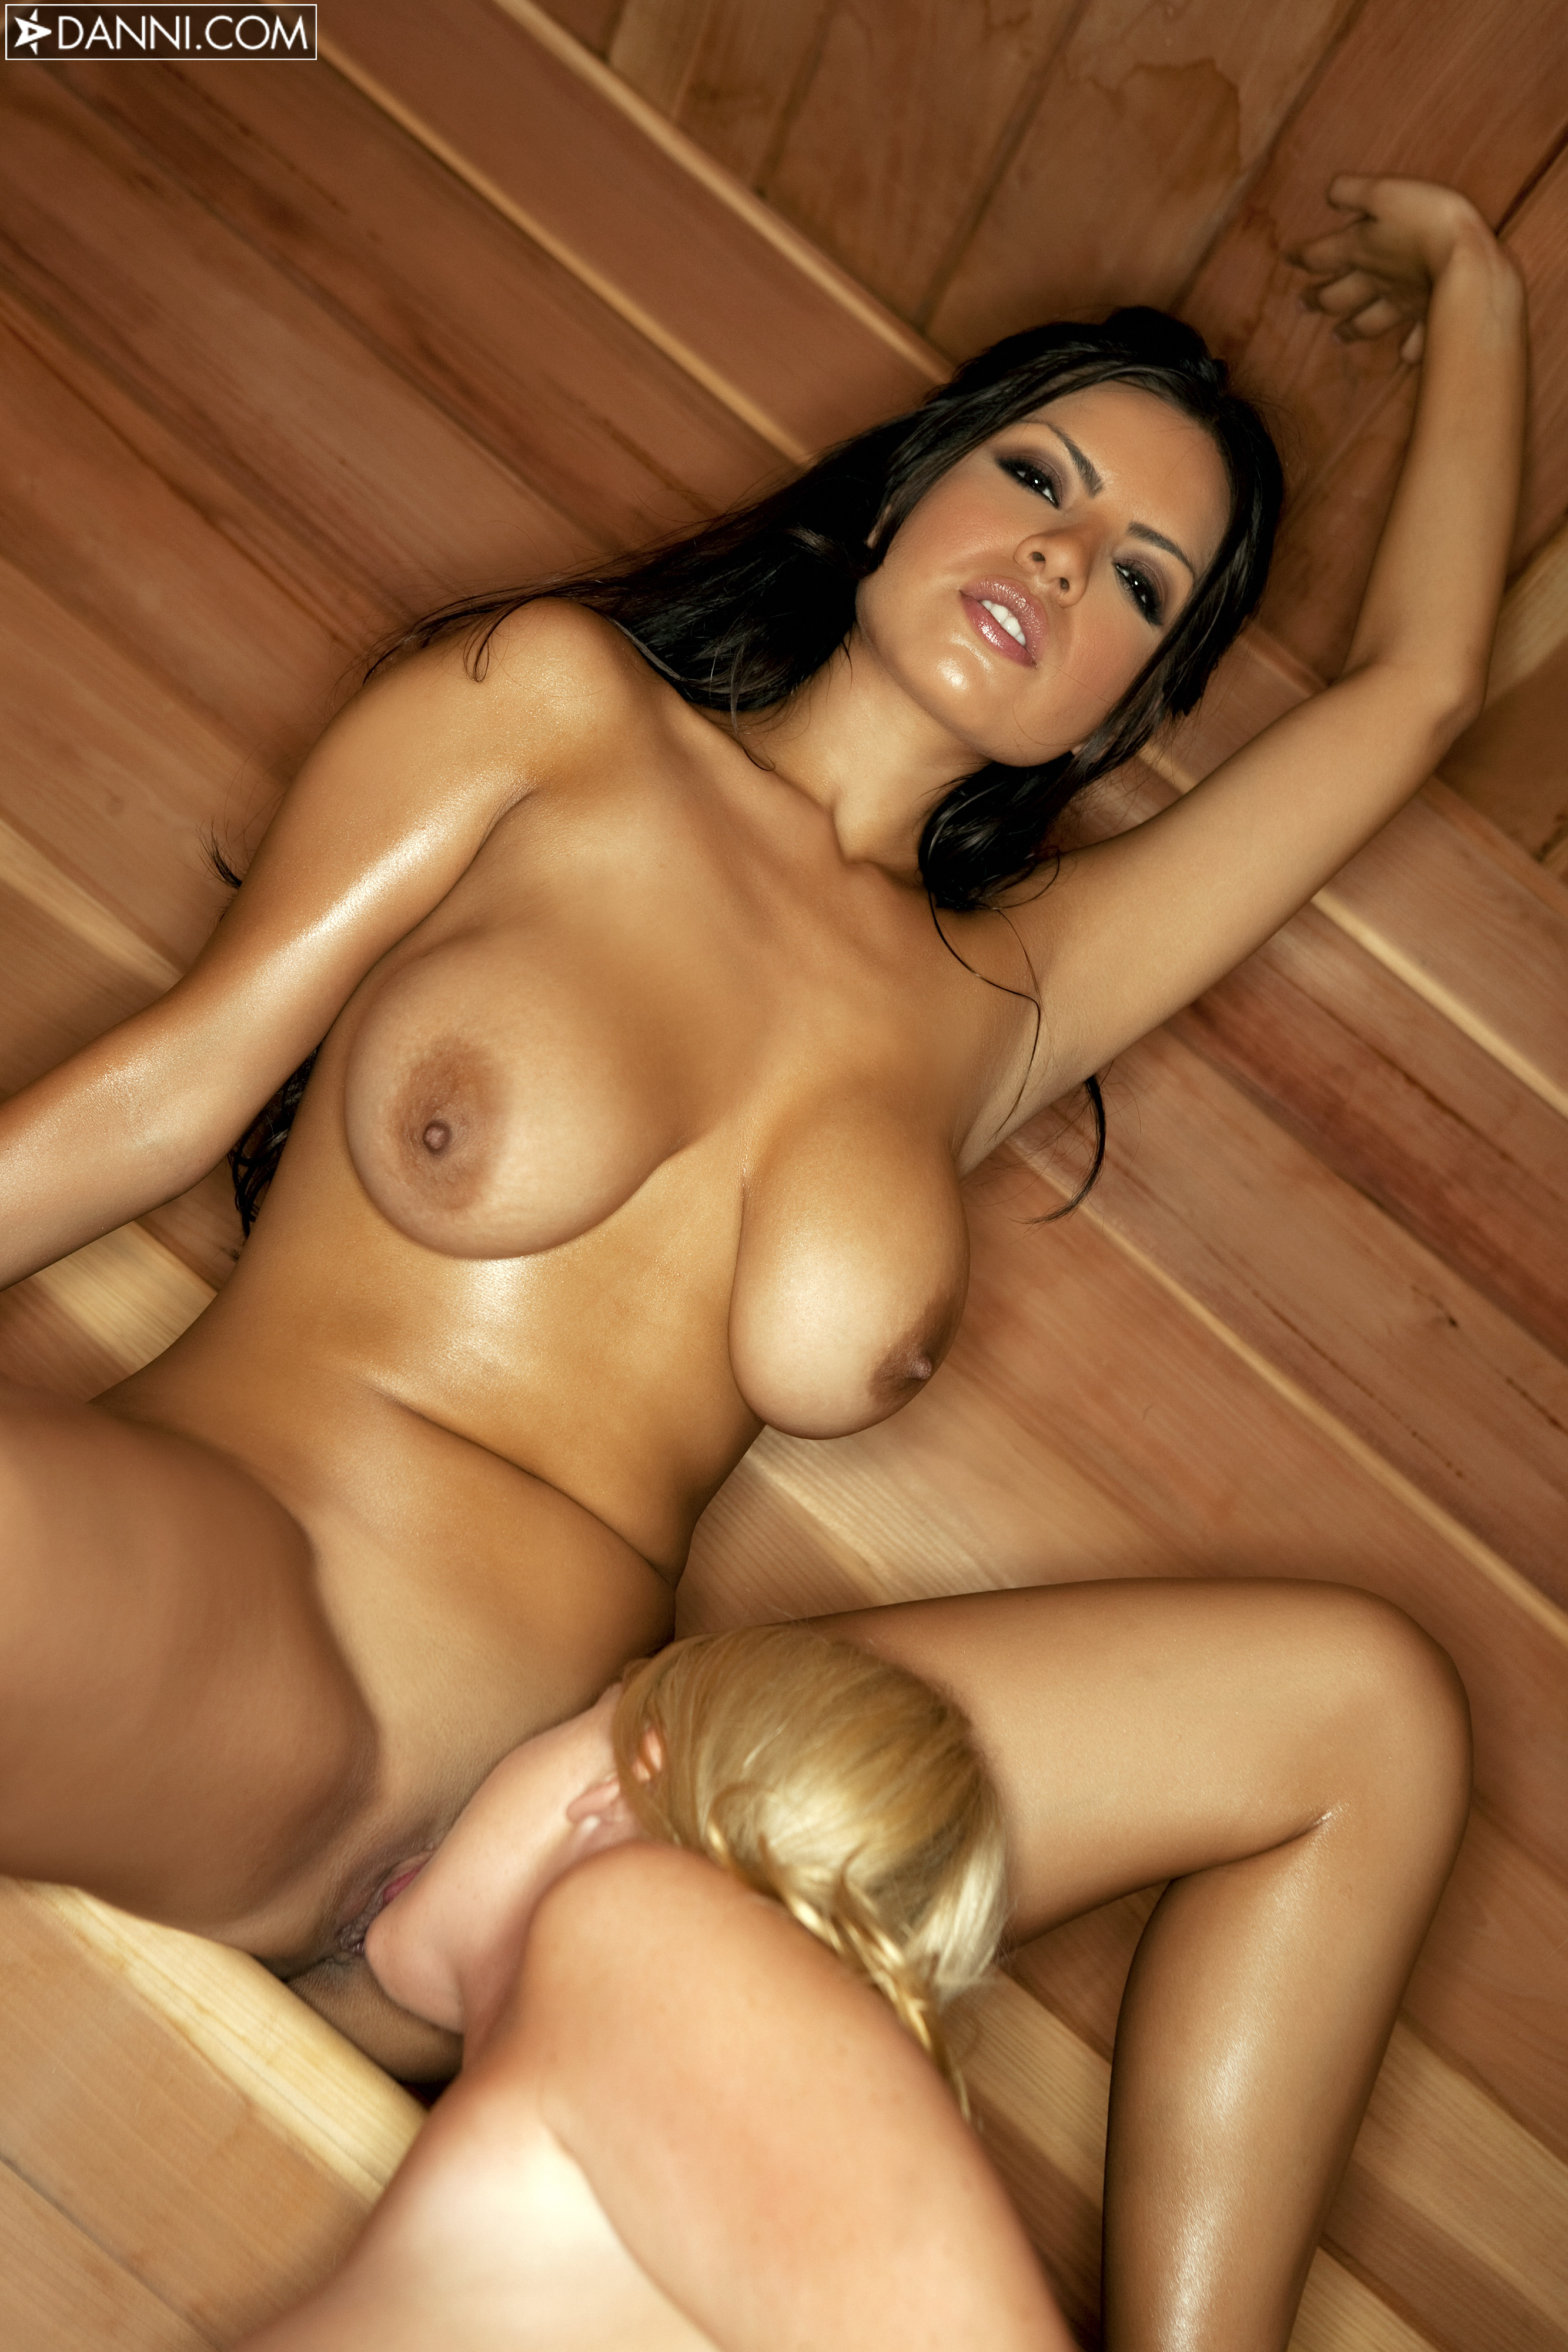 Секс грудастых брюнеток в сауне 12 фотография